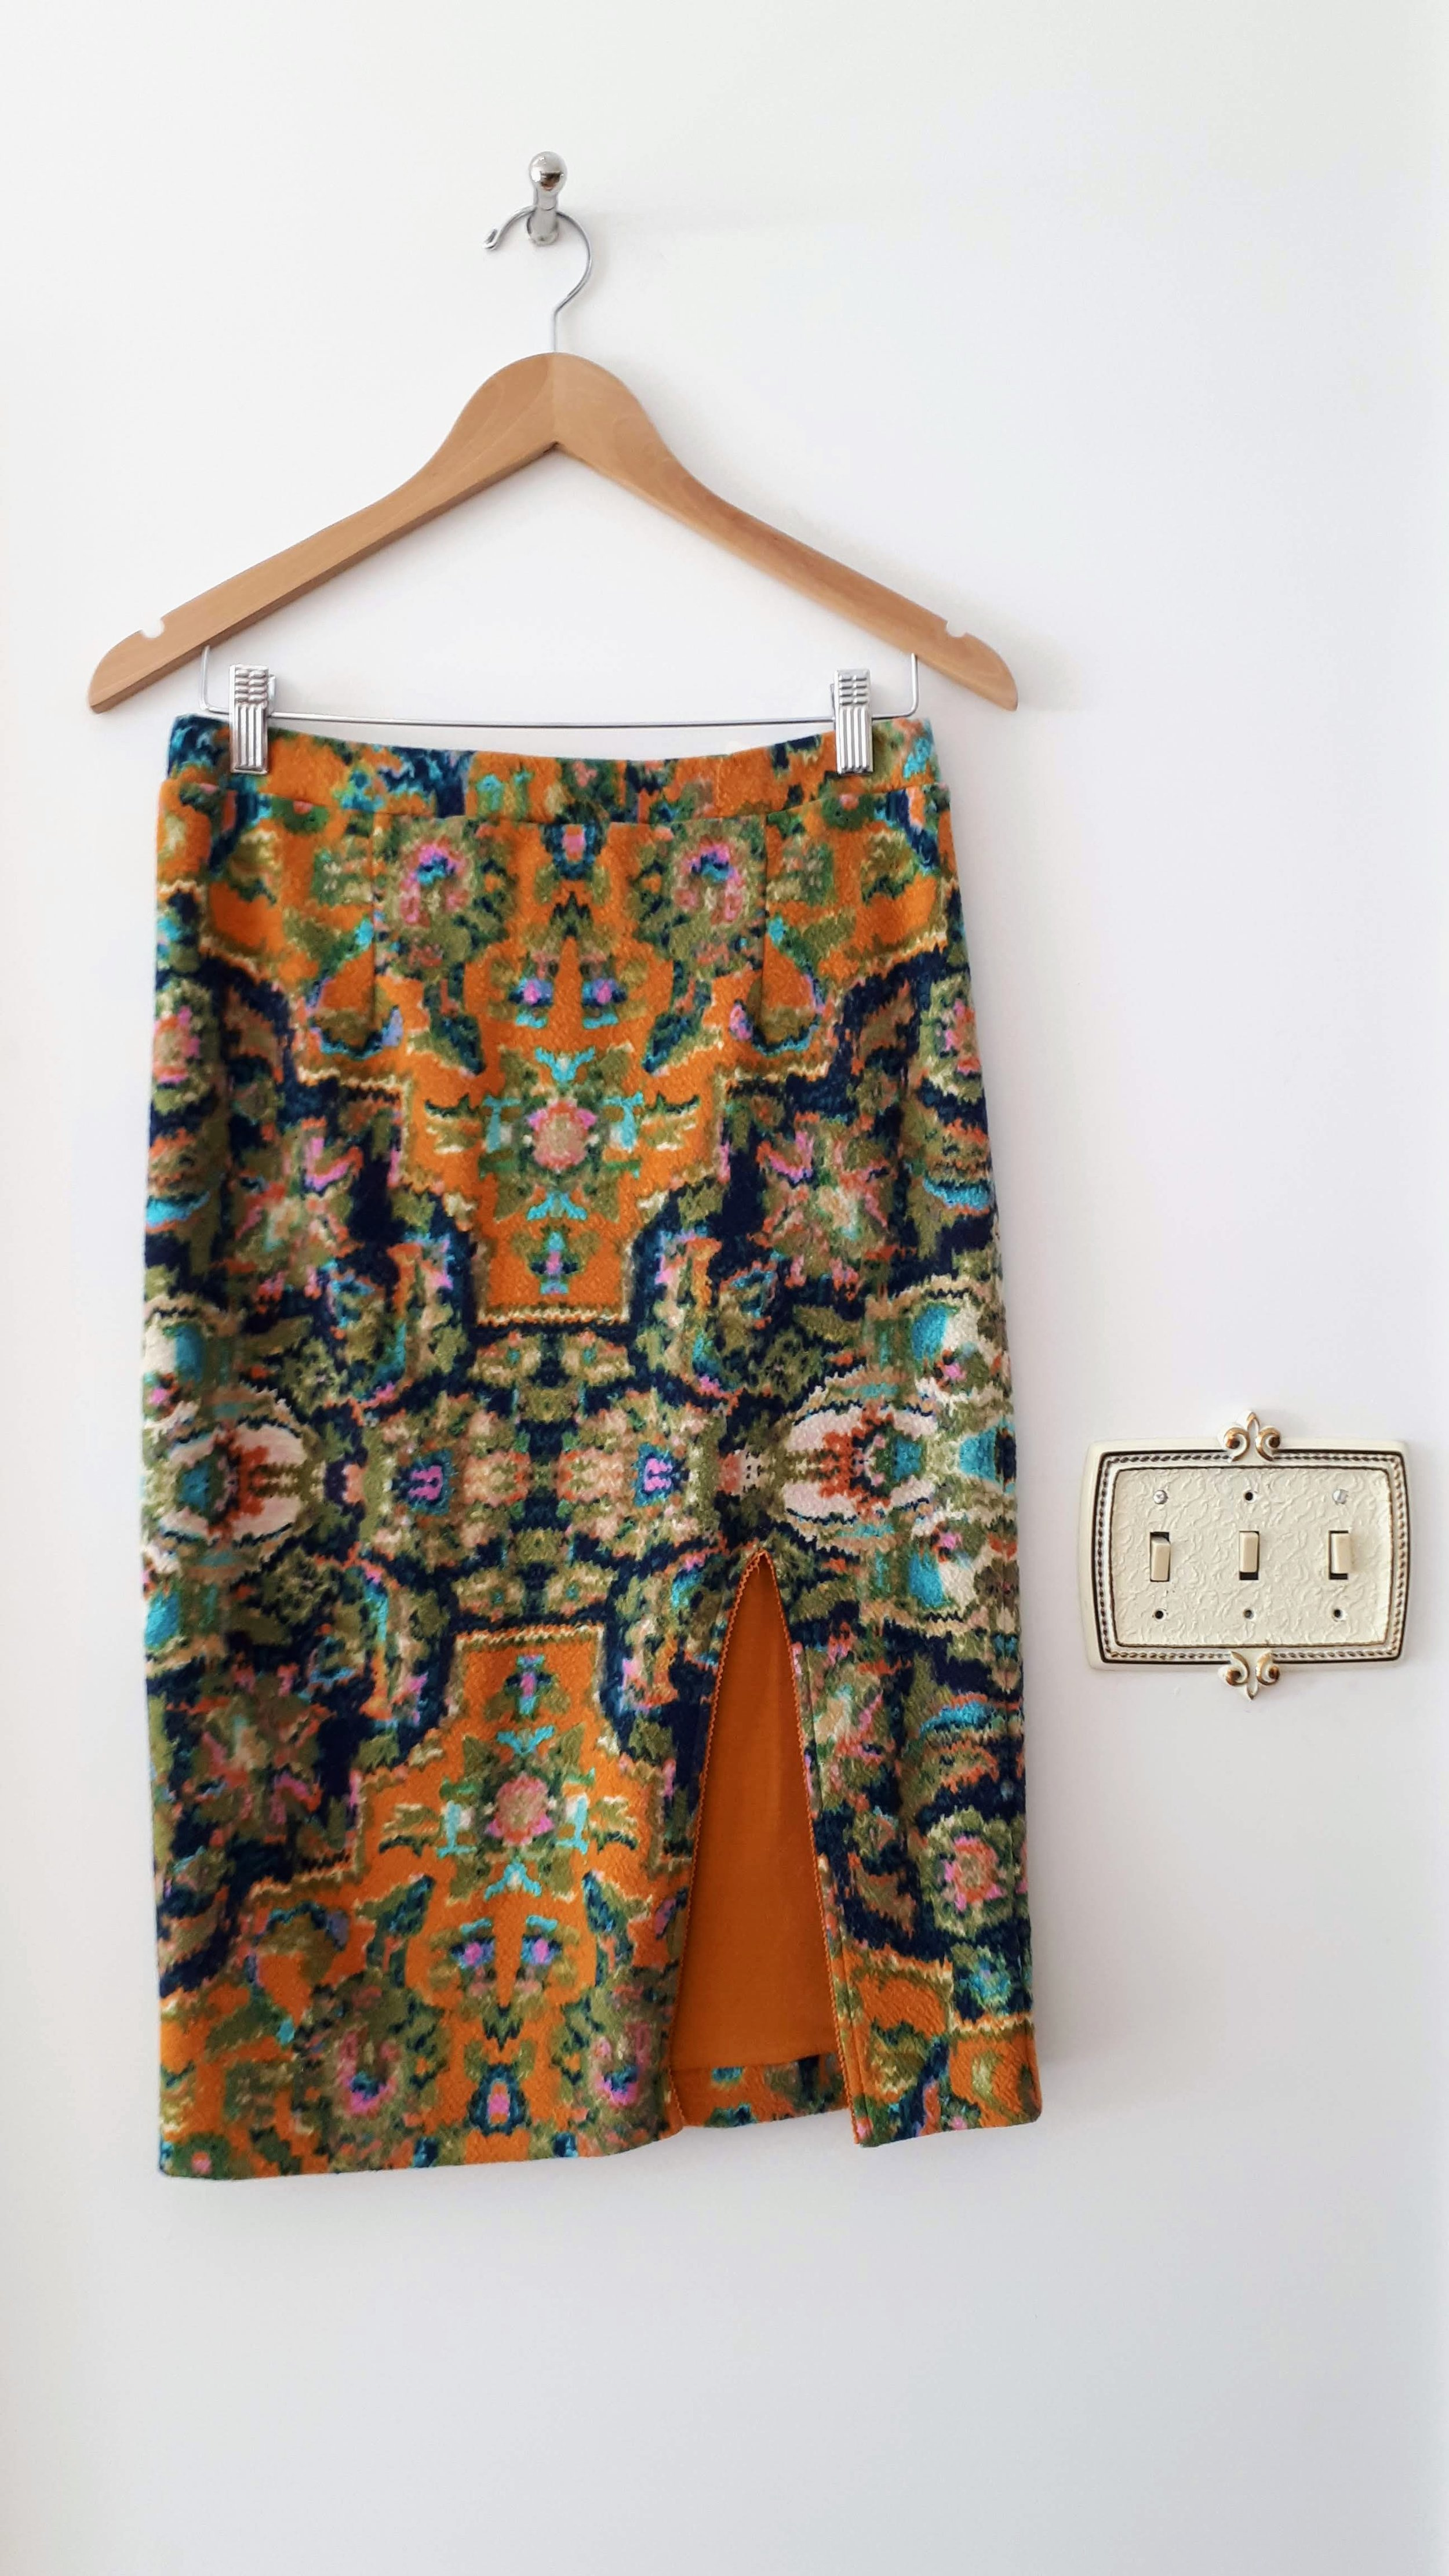 Maeve skirt; Size M, $28